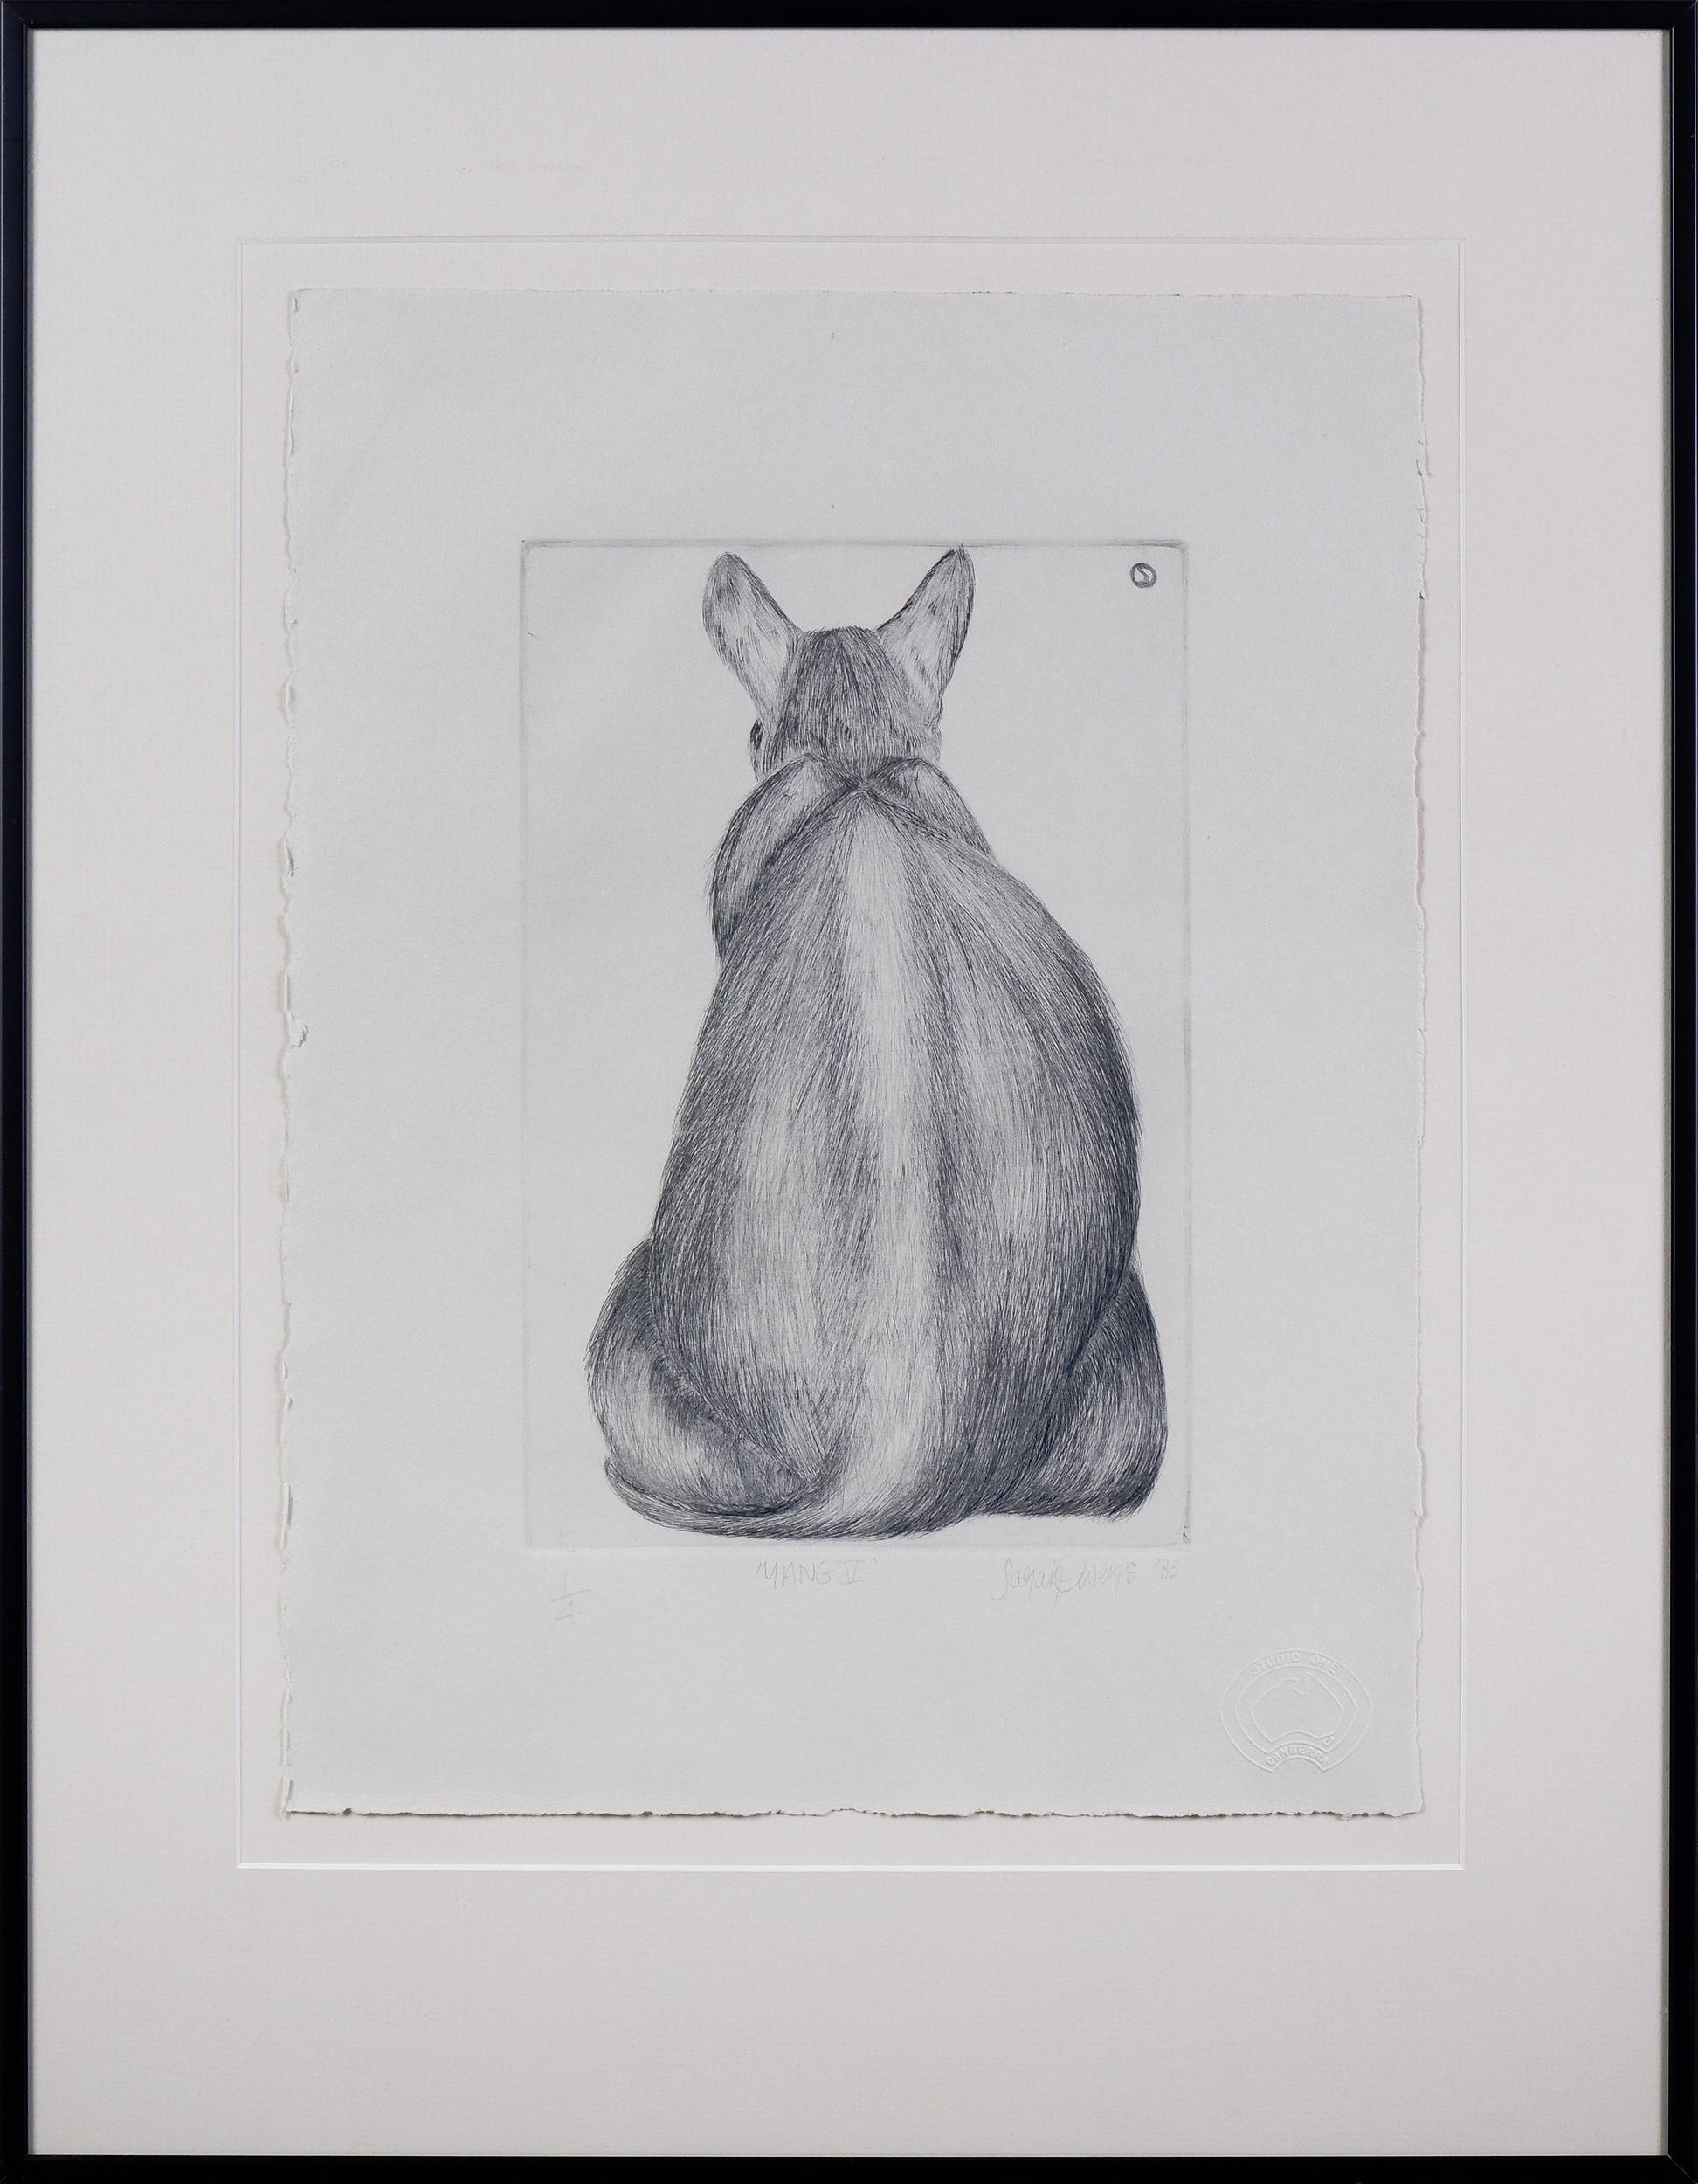 'Sarah Owens (working 1980s, Australian), Yang V 1983, Sugarlift Aquatint, Edition 1/4, 25 x 16 cm (image size)'